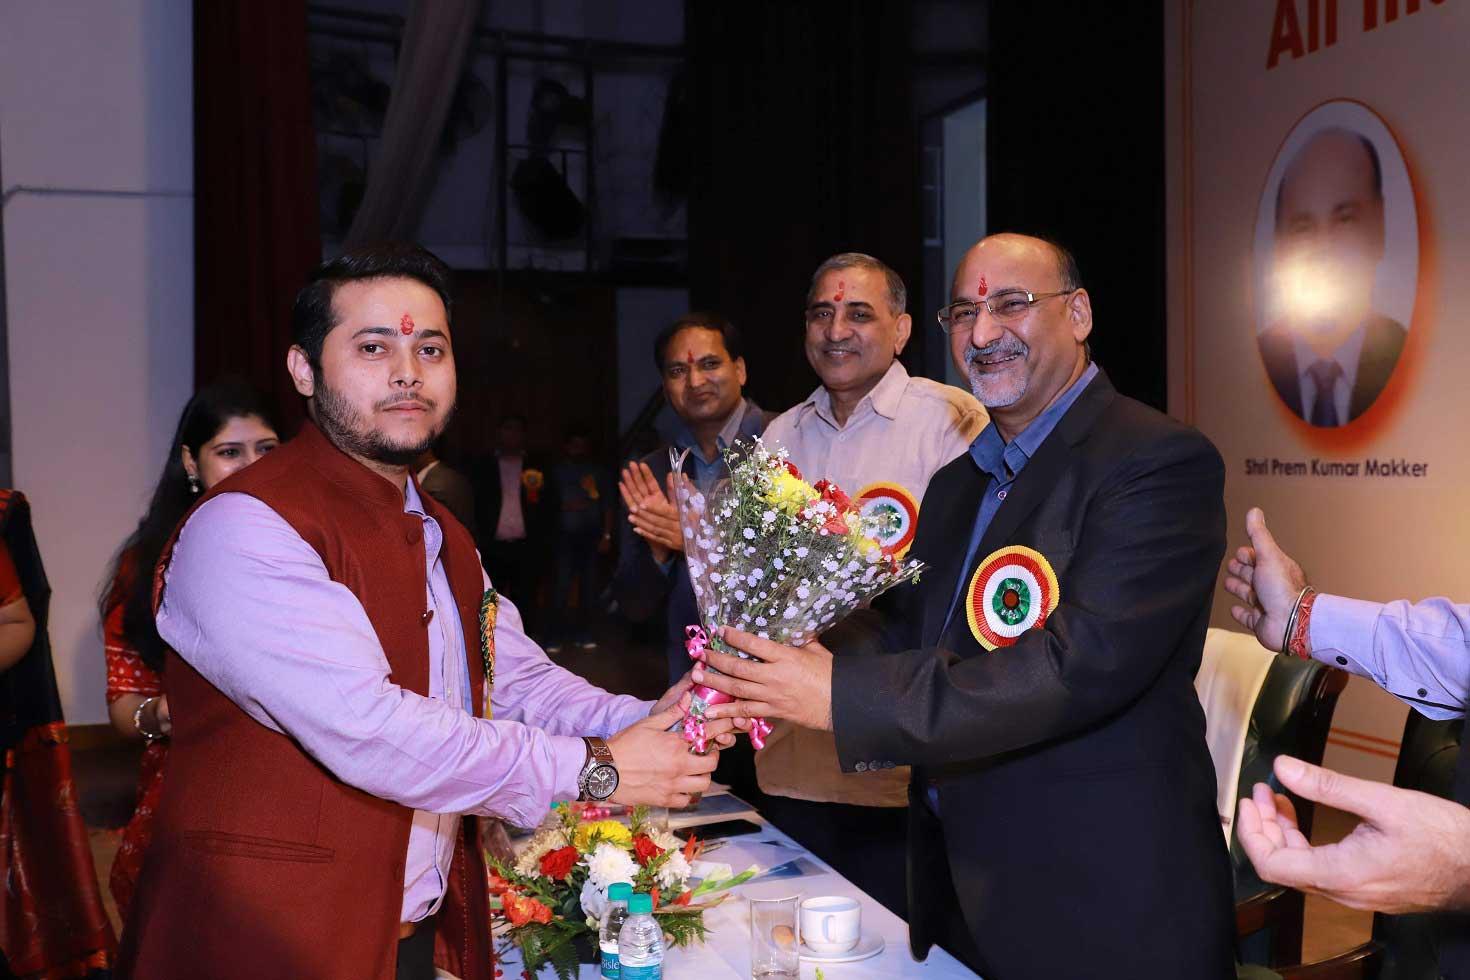 Mr KK Nair Taking bouquet by colleague